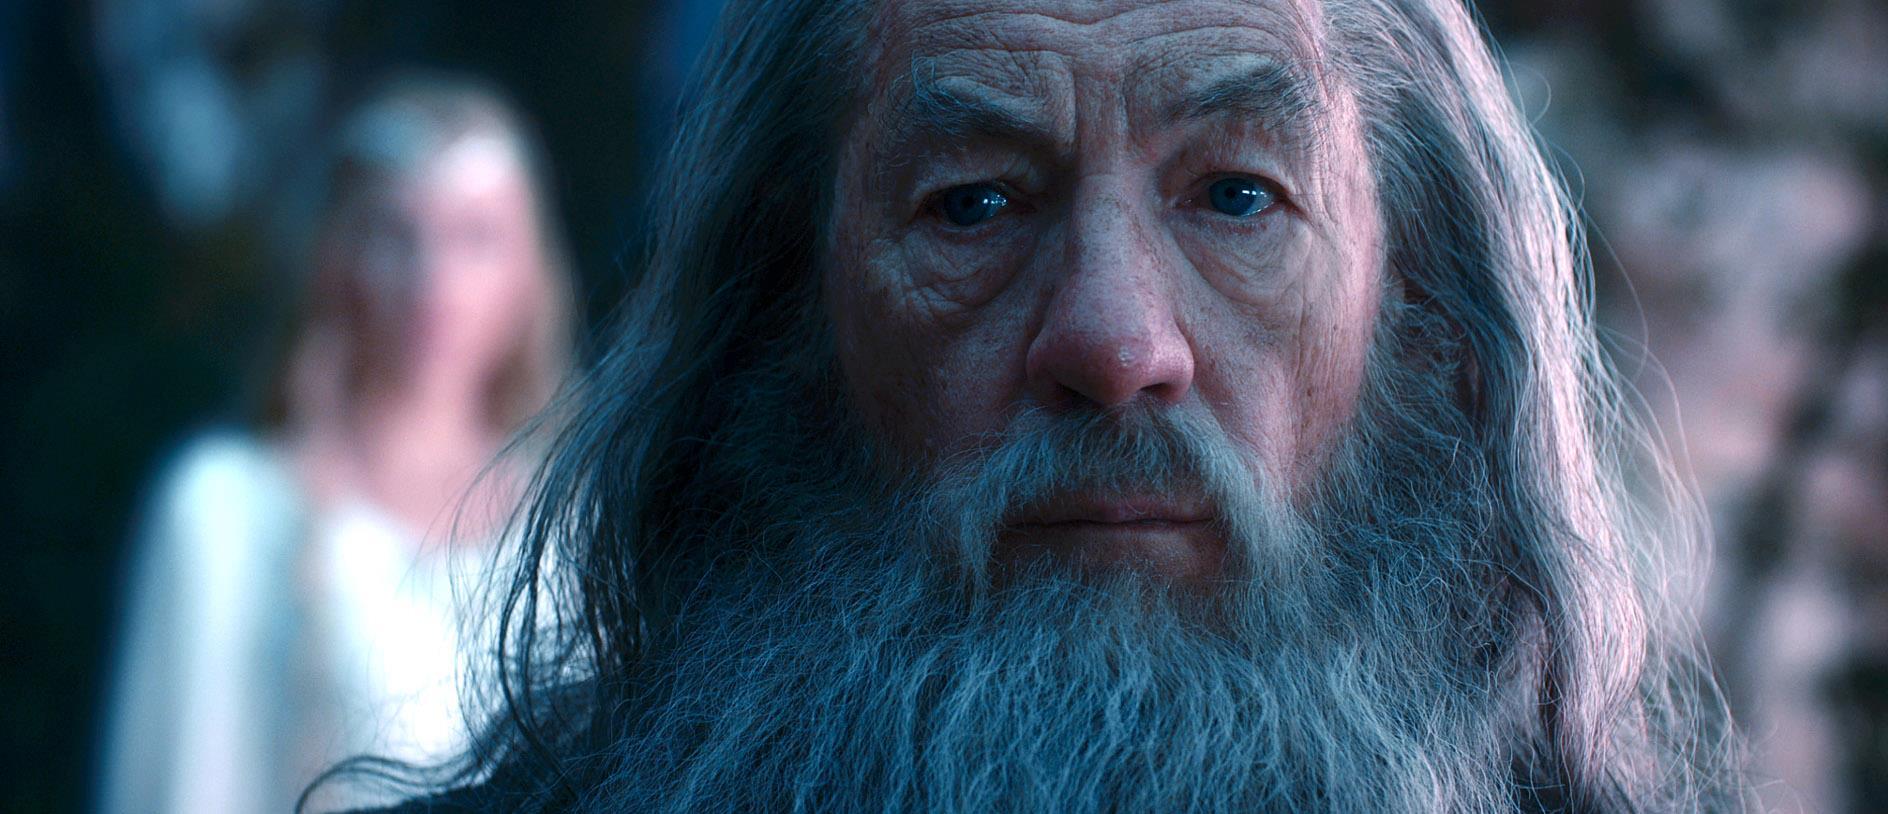 Gandalf is watching you - but who is watching Gandalf? (c) Warner Bros.